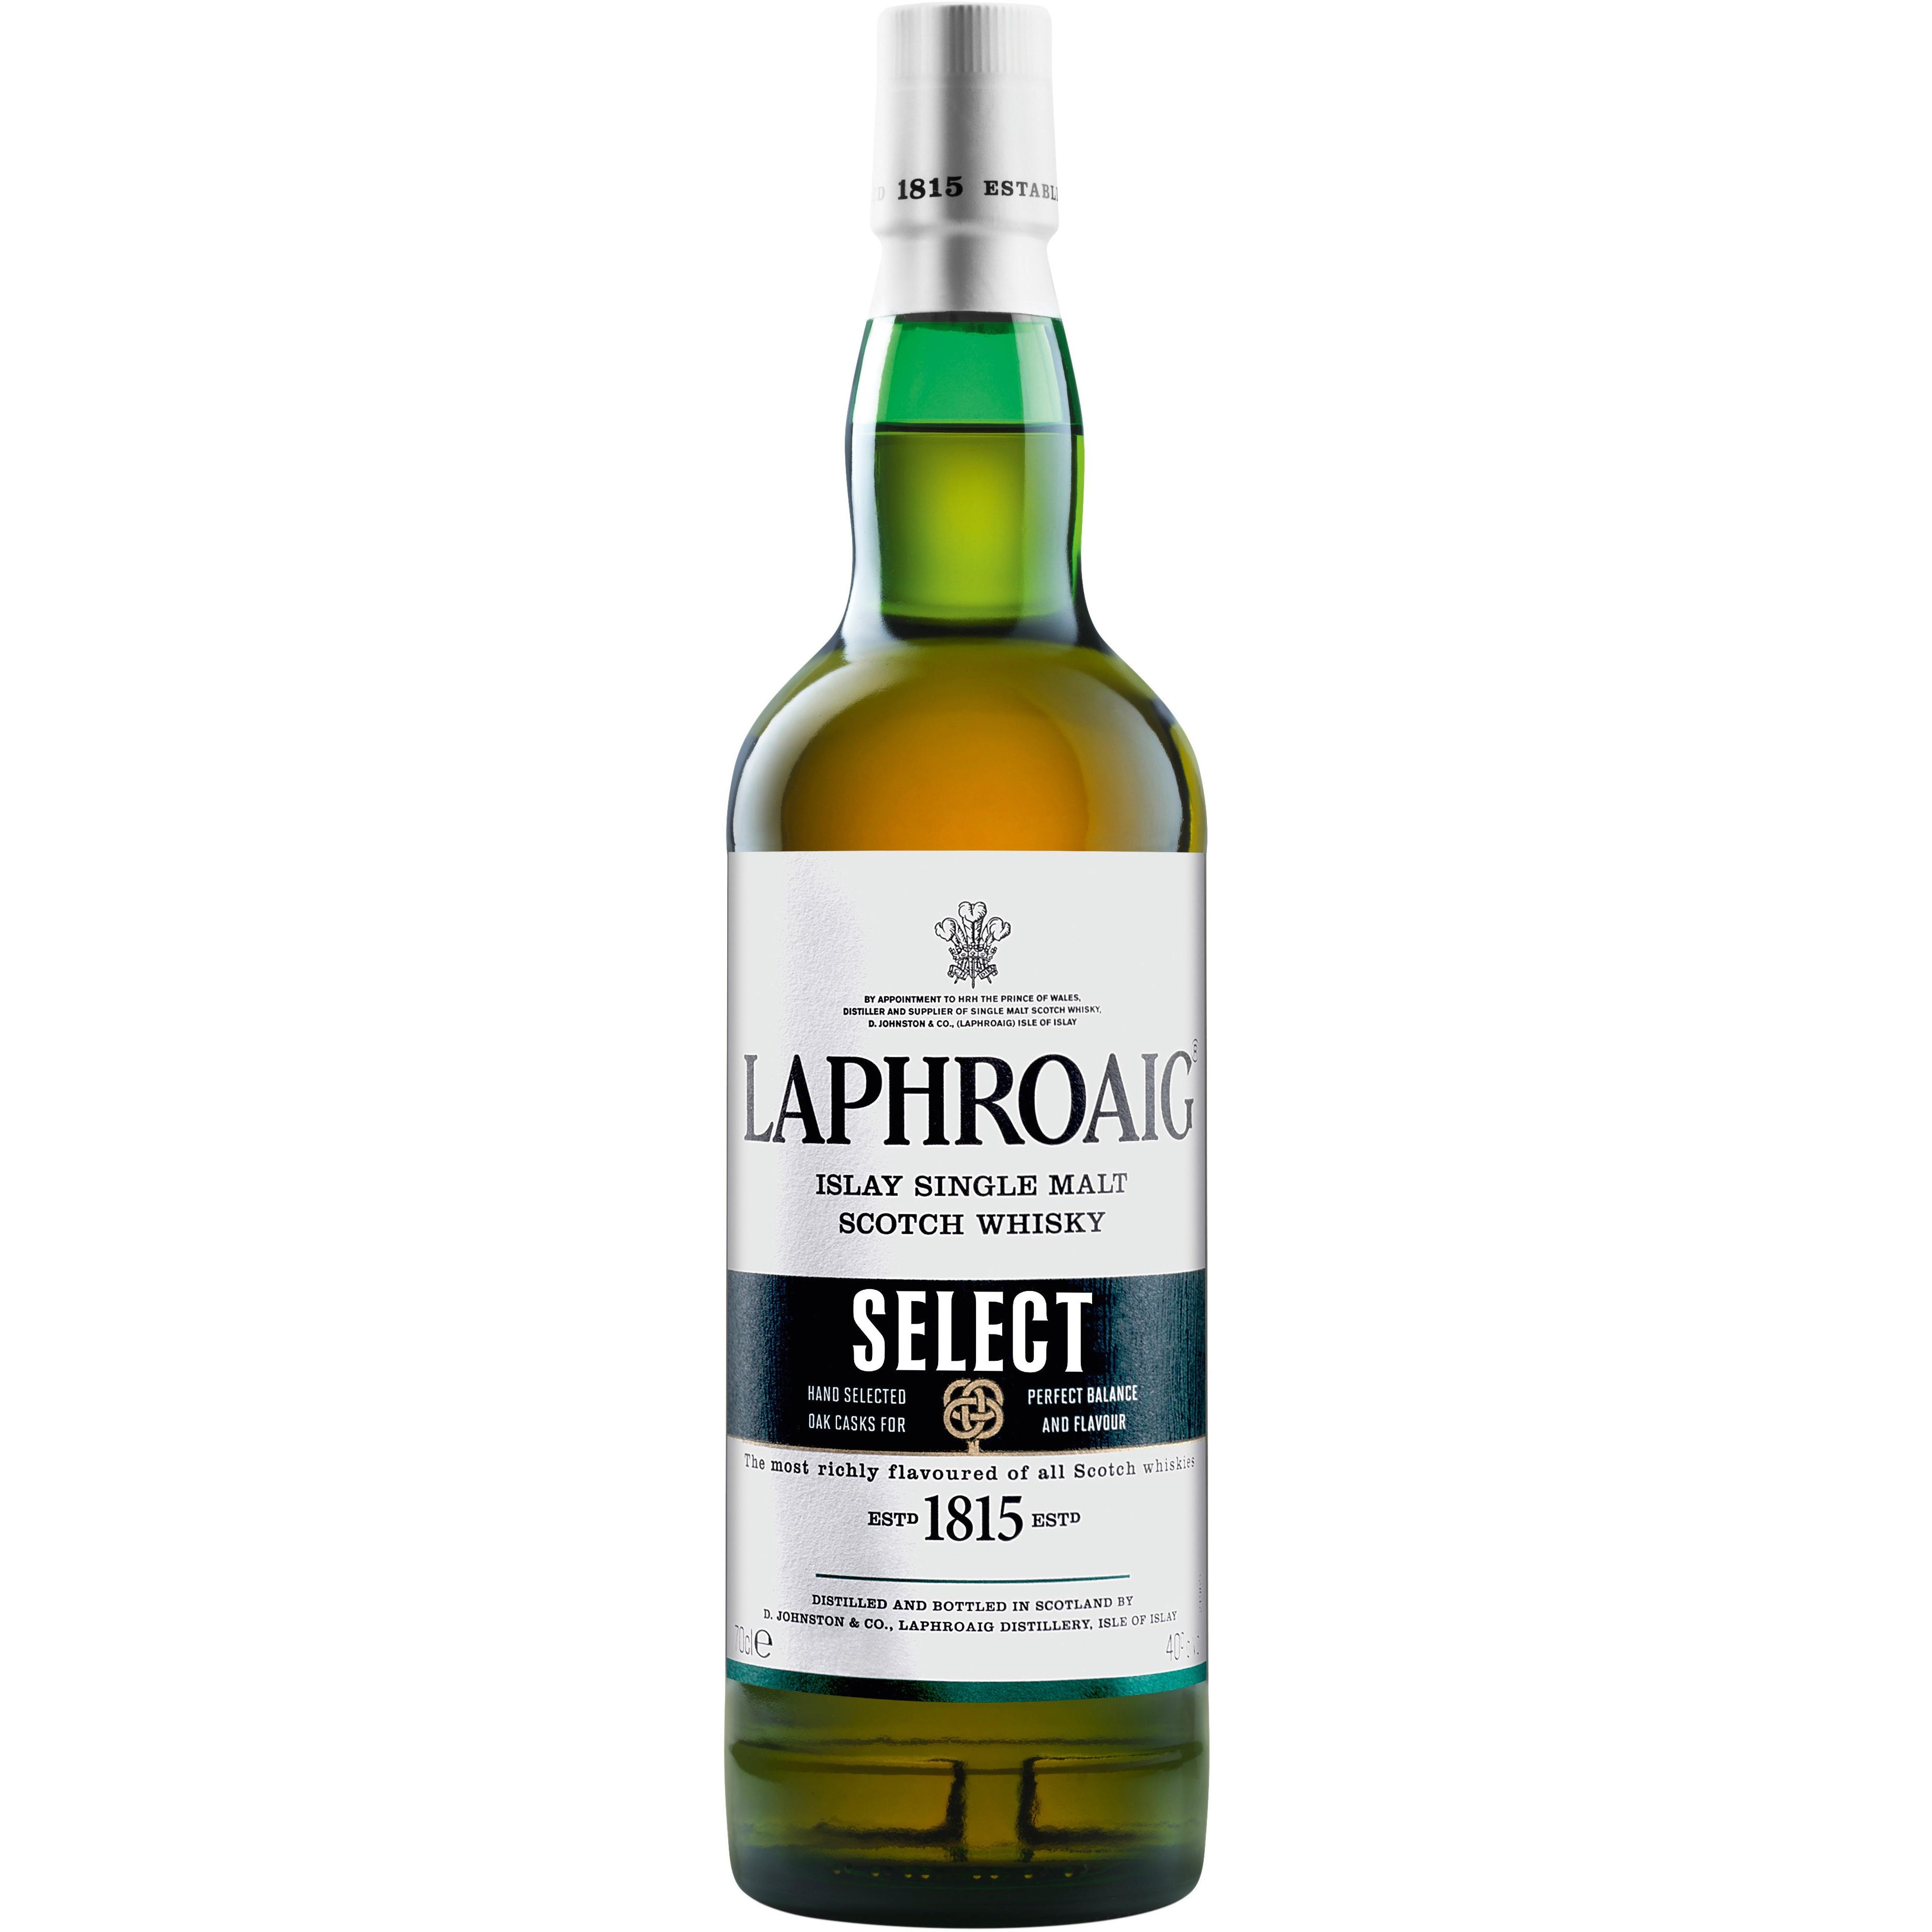 Laphroaig Select Islay Single Malt Scotch Whisky 0,7l